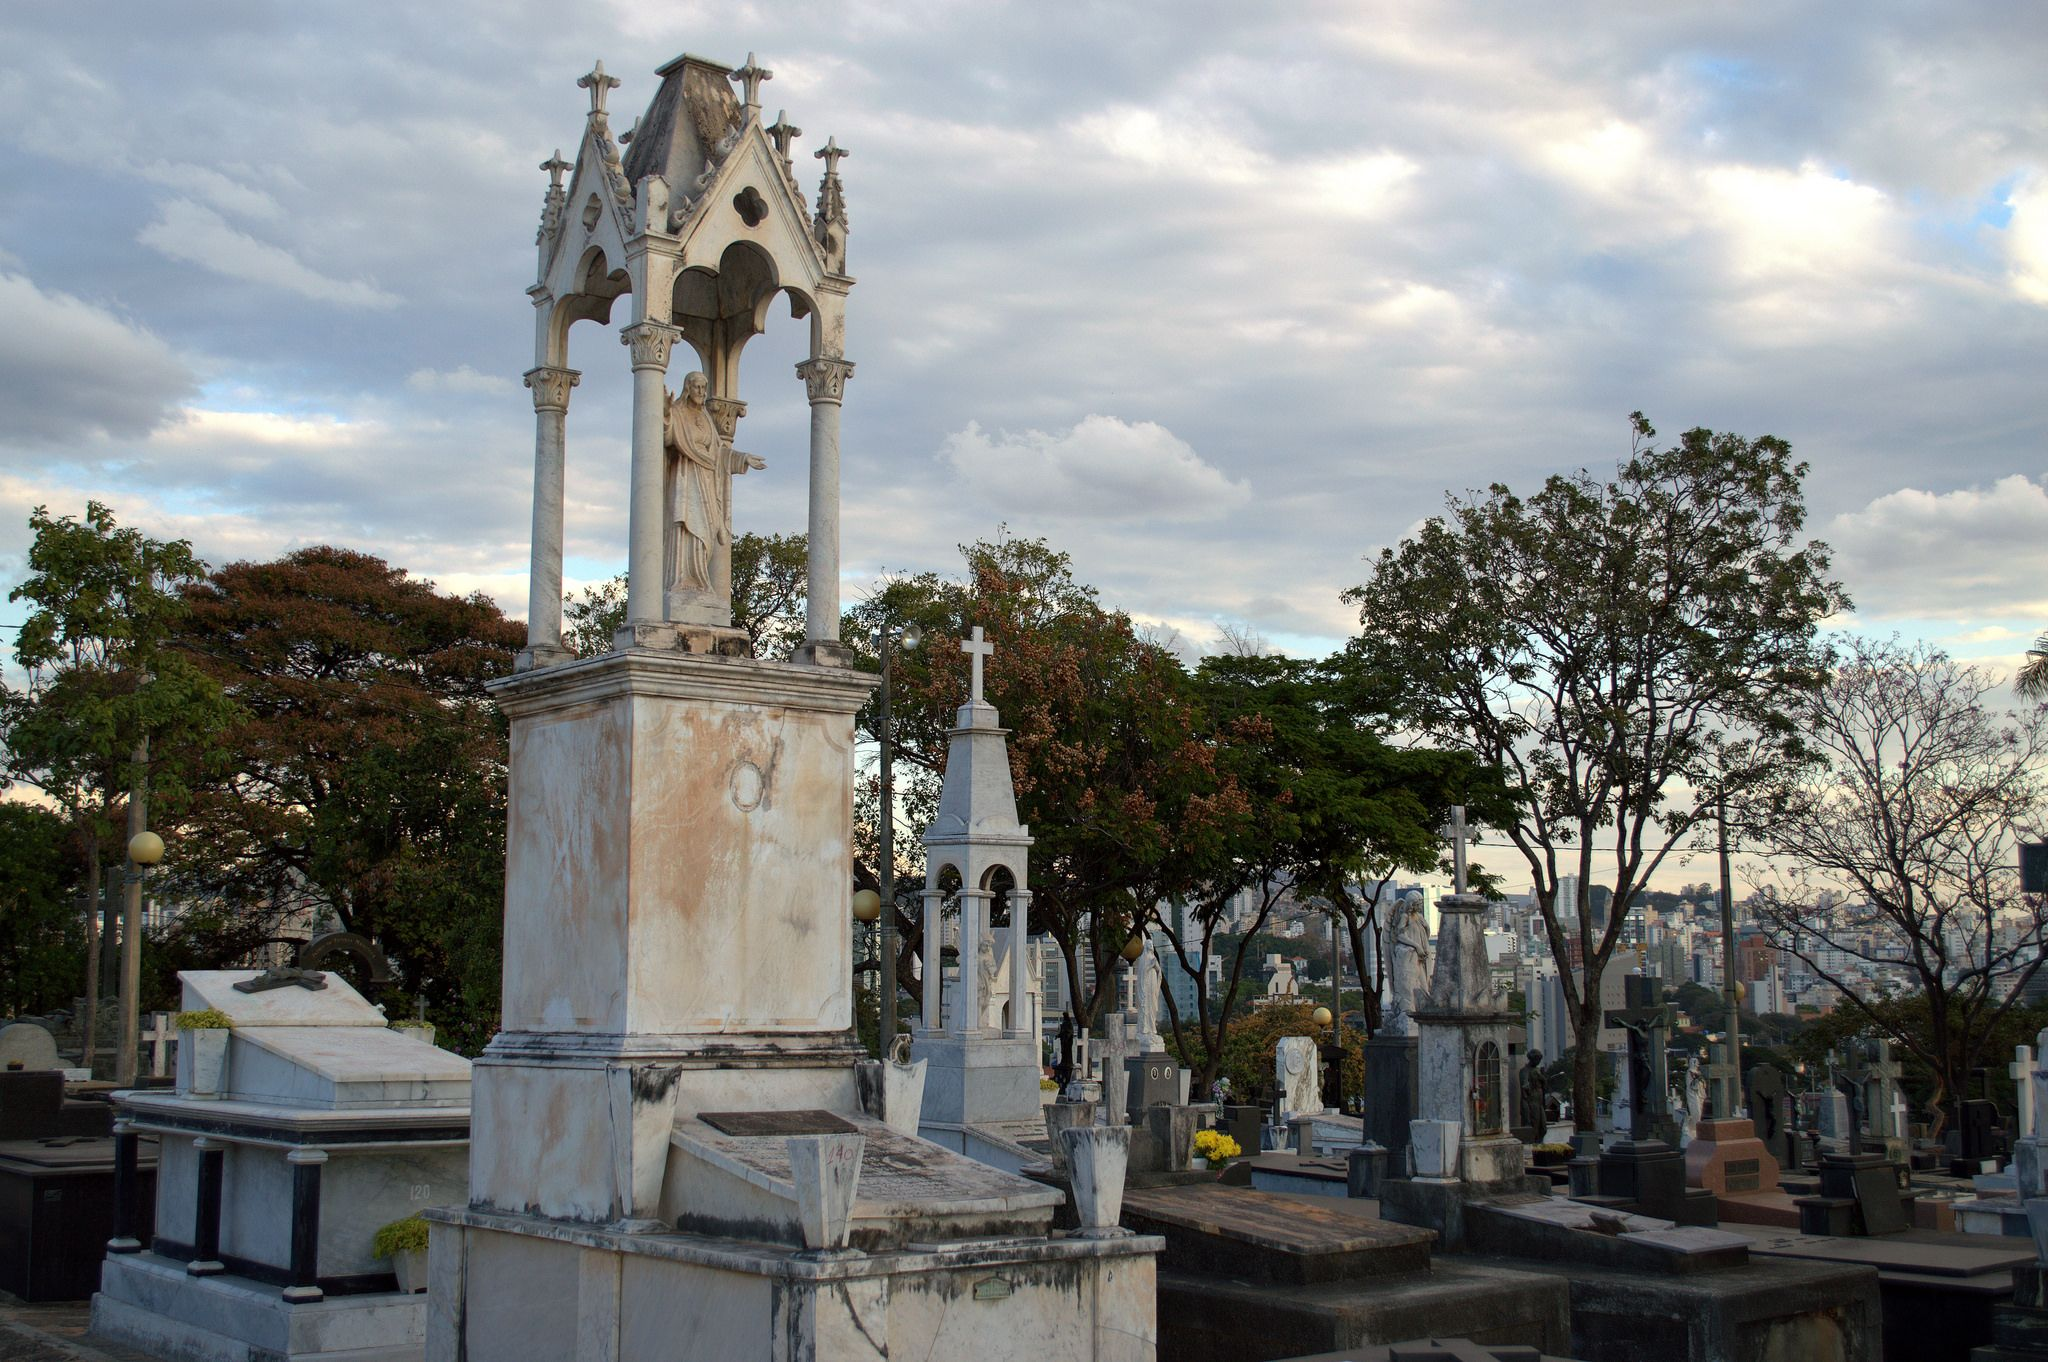 https://flic.kr/p/C6jk6d | cemiterio 22